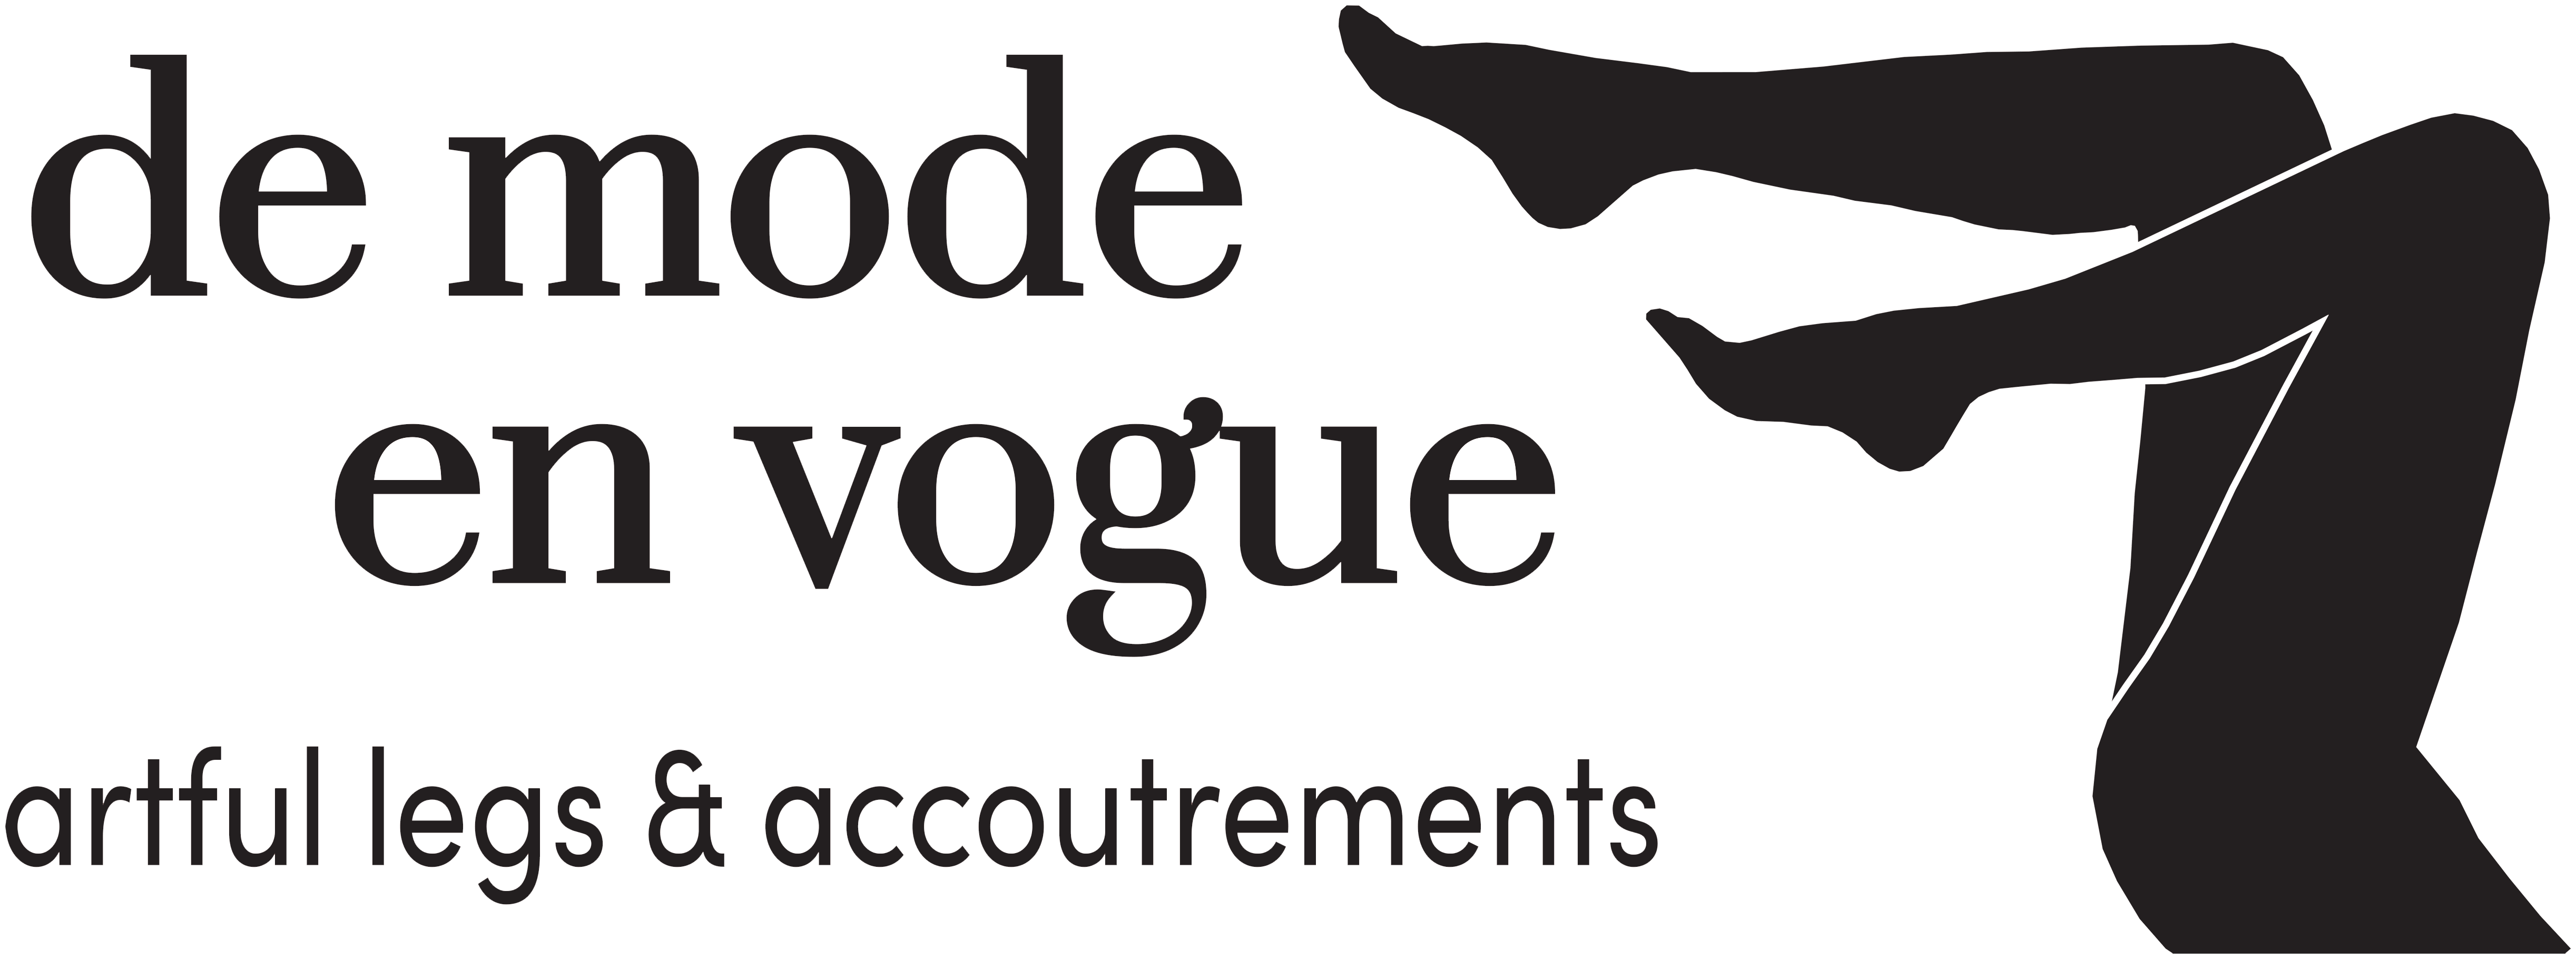 De Mode En Vogue - artful legs & accoutrements tights & leggings, stockings, socks for men and women